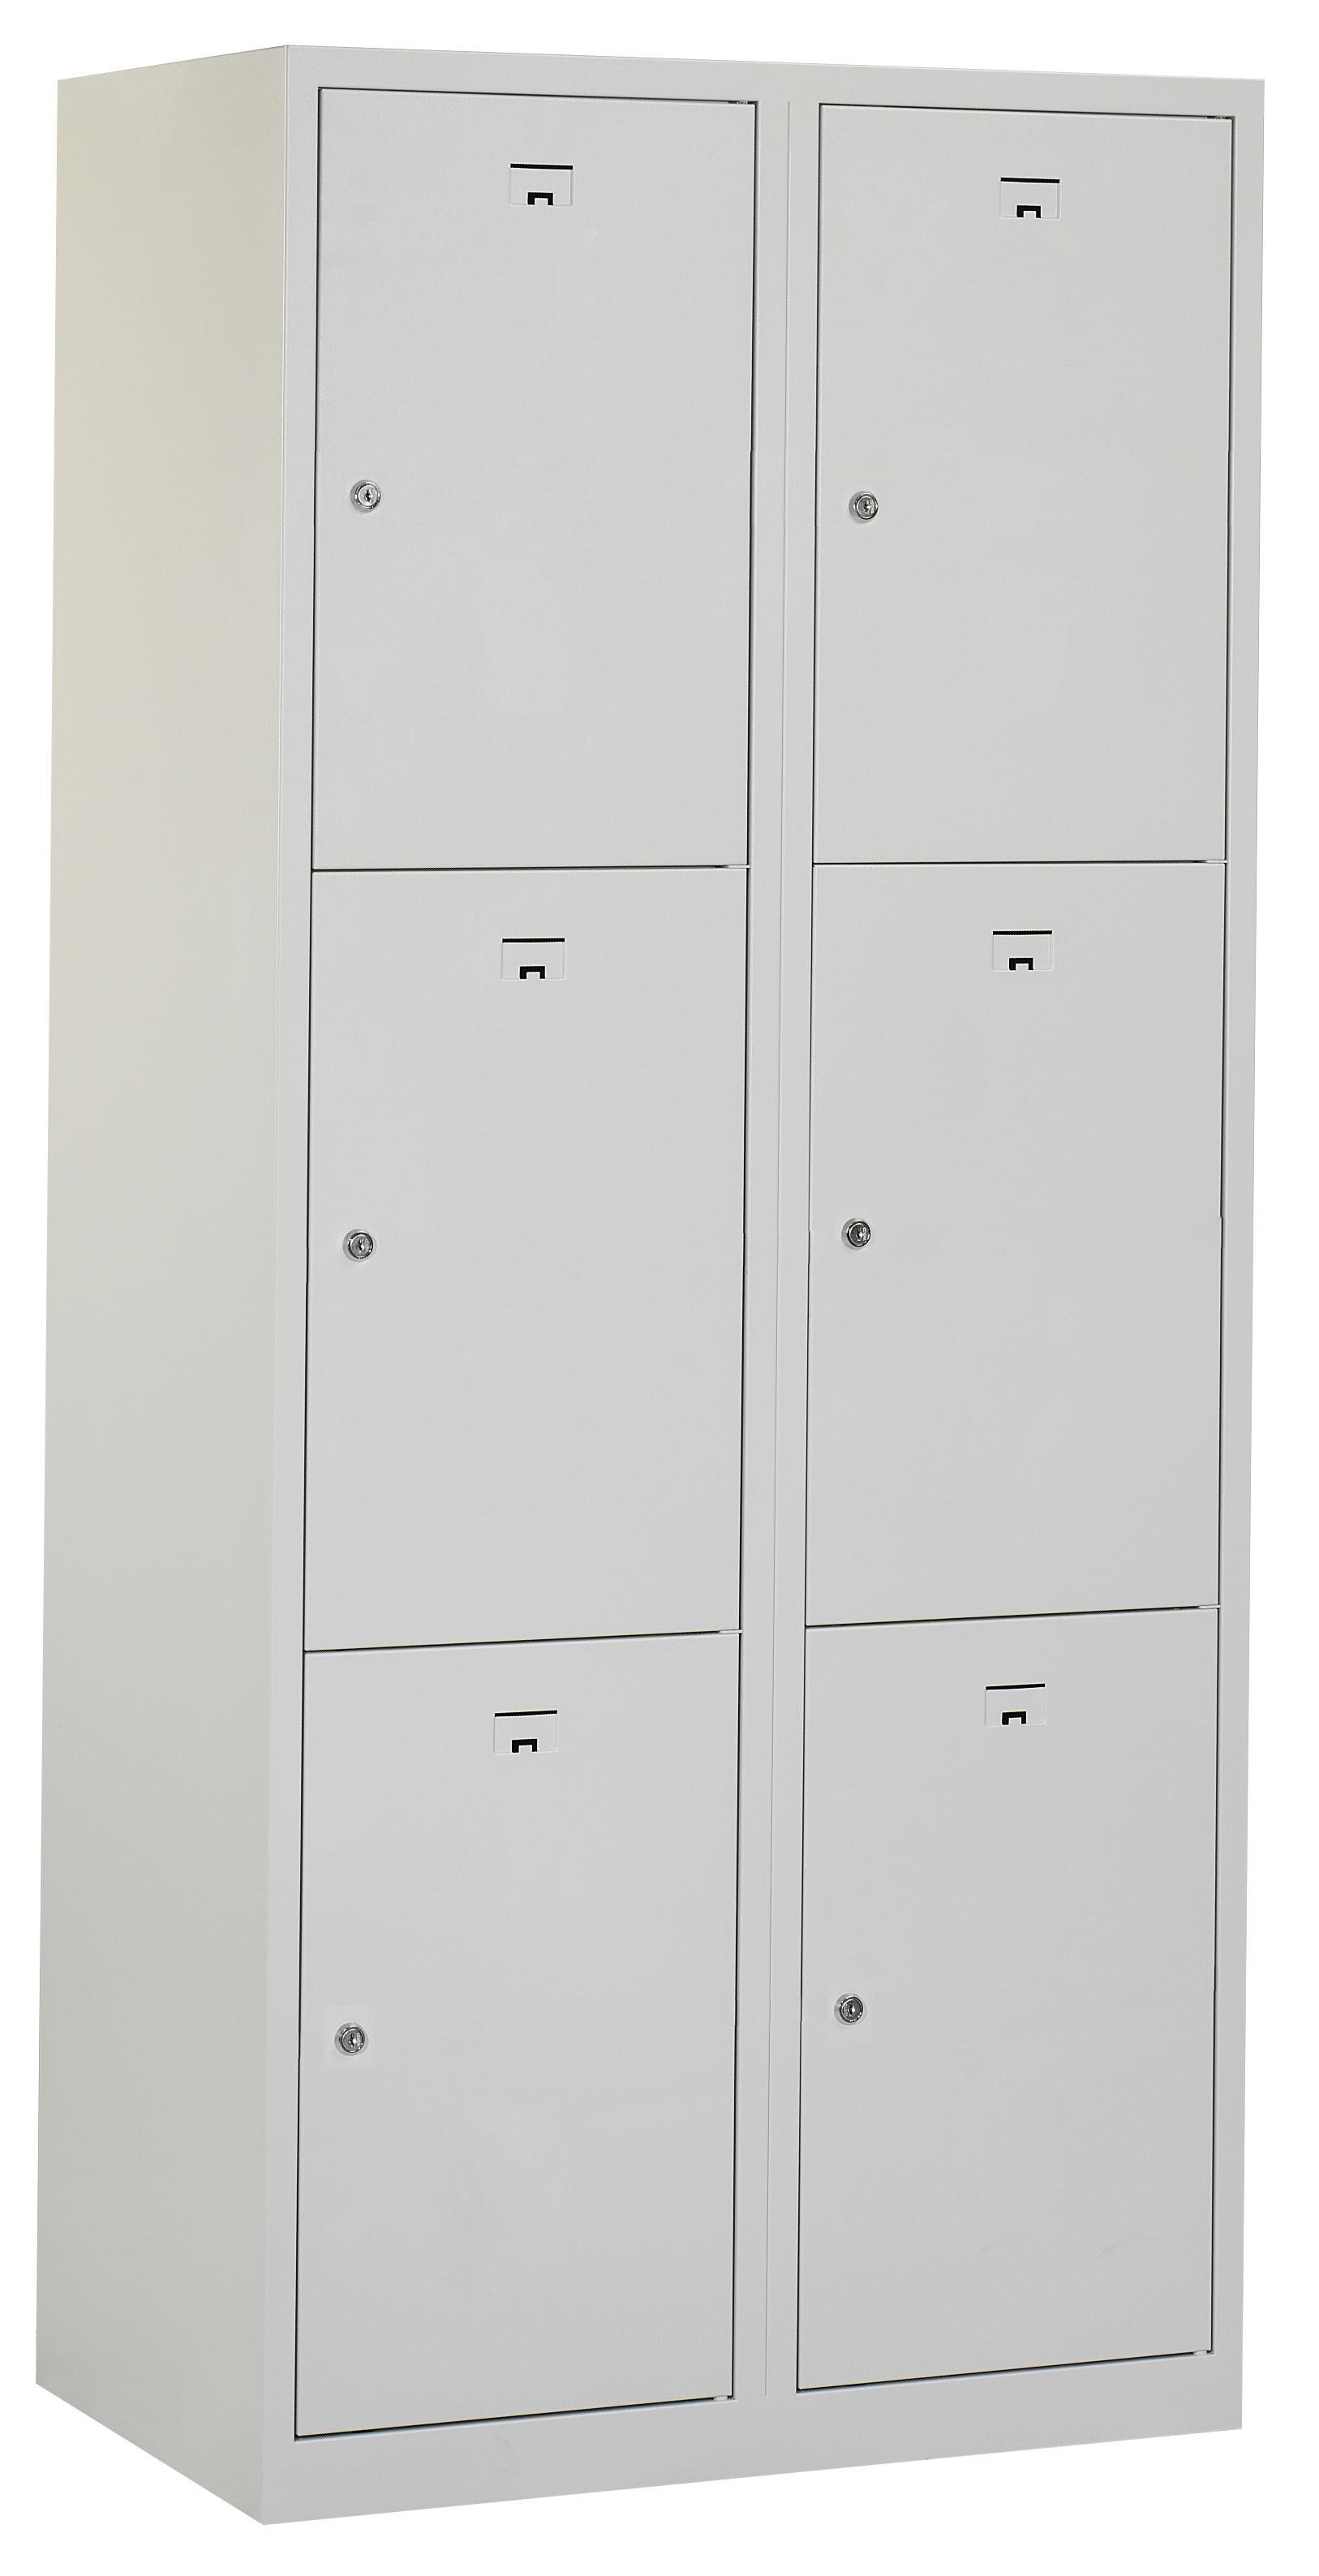 Flex Lockerkast 2x3-vaks (180x80x50cm)